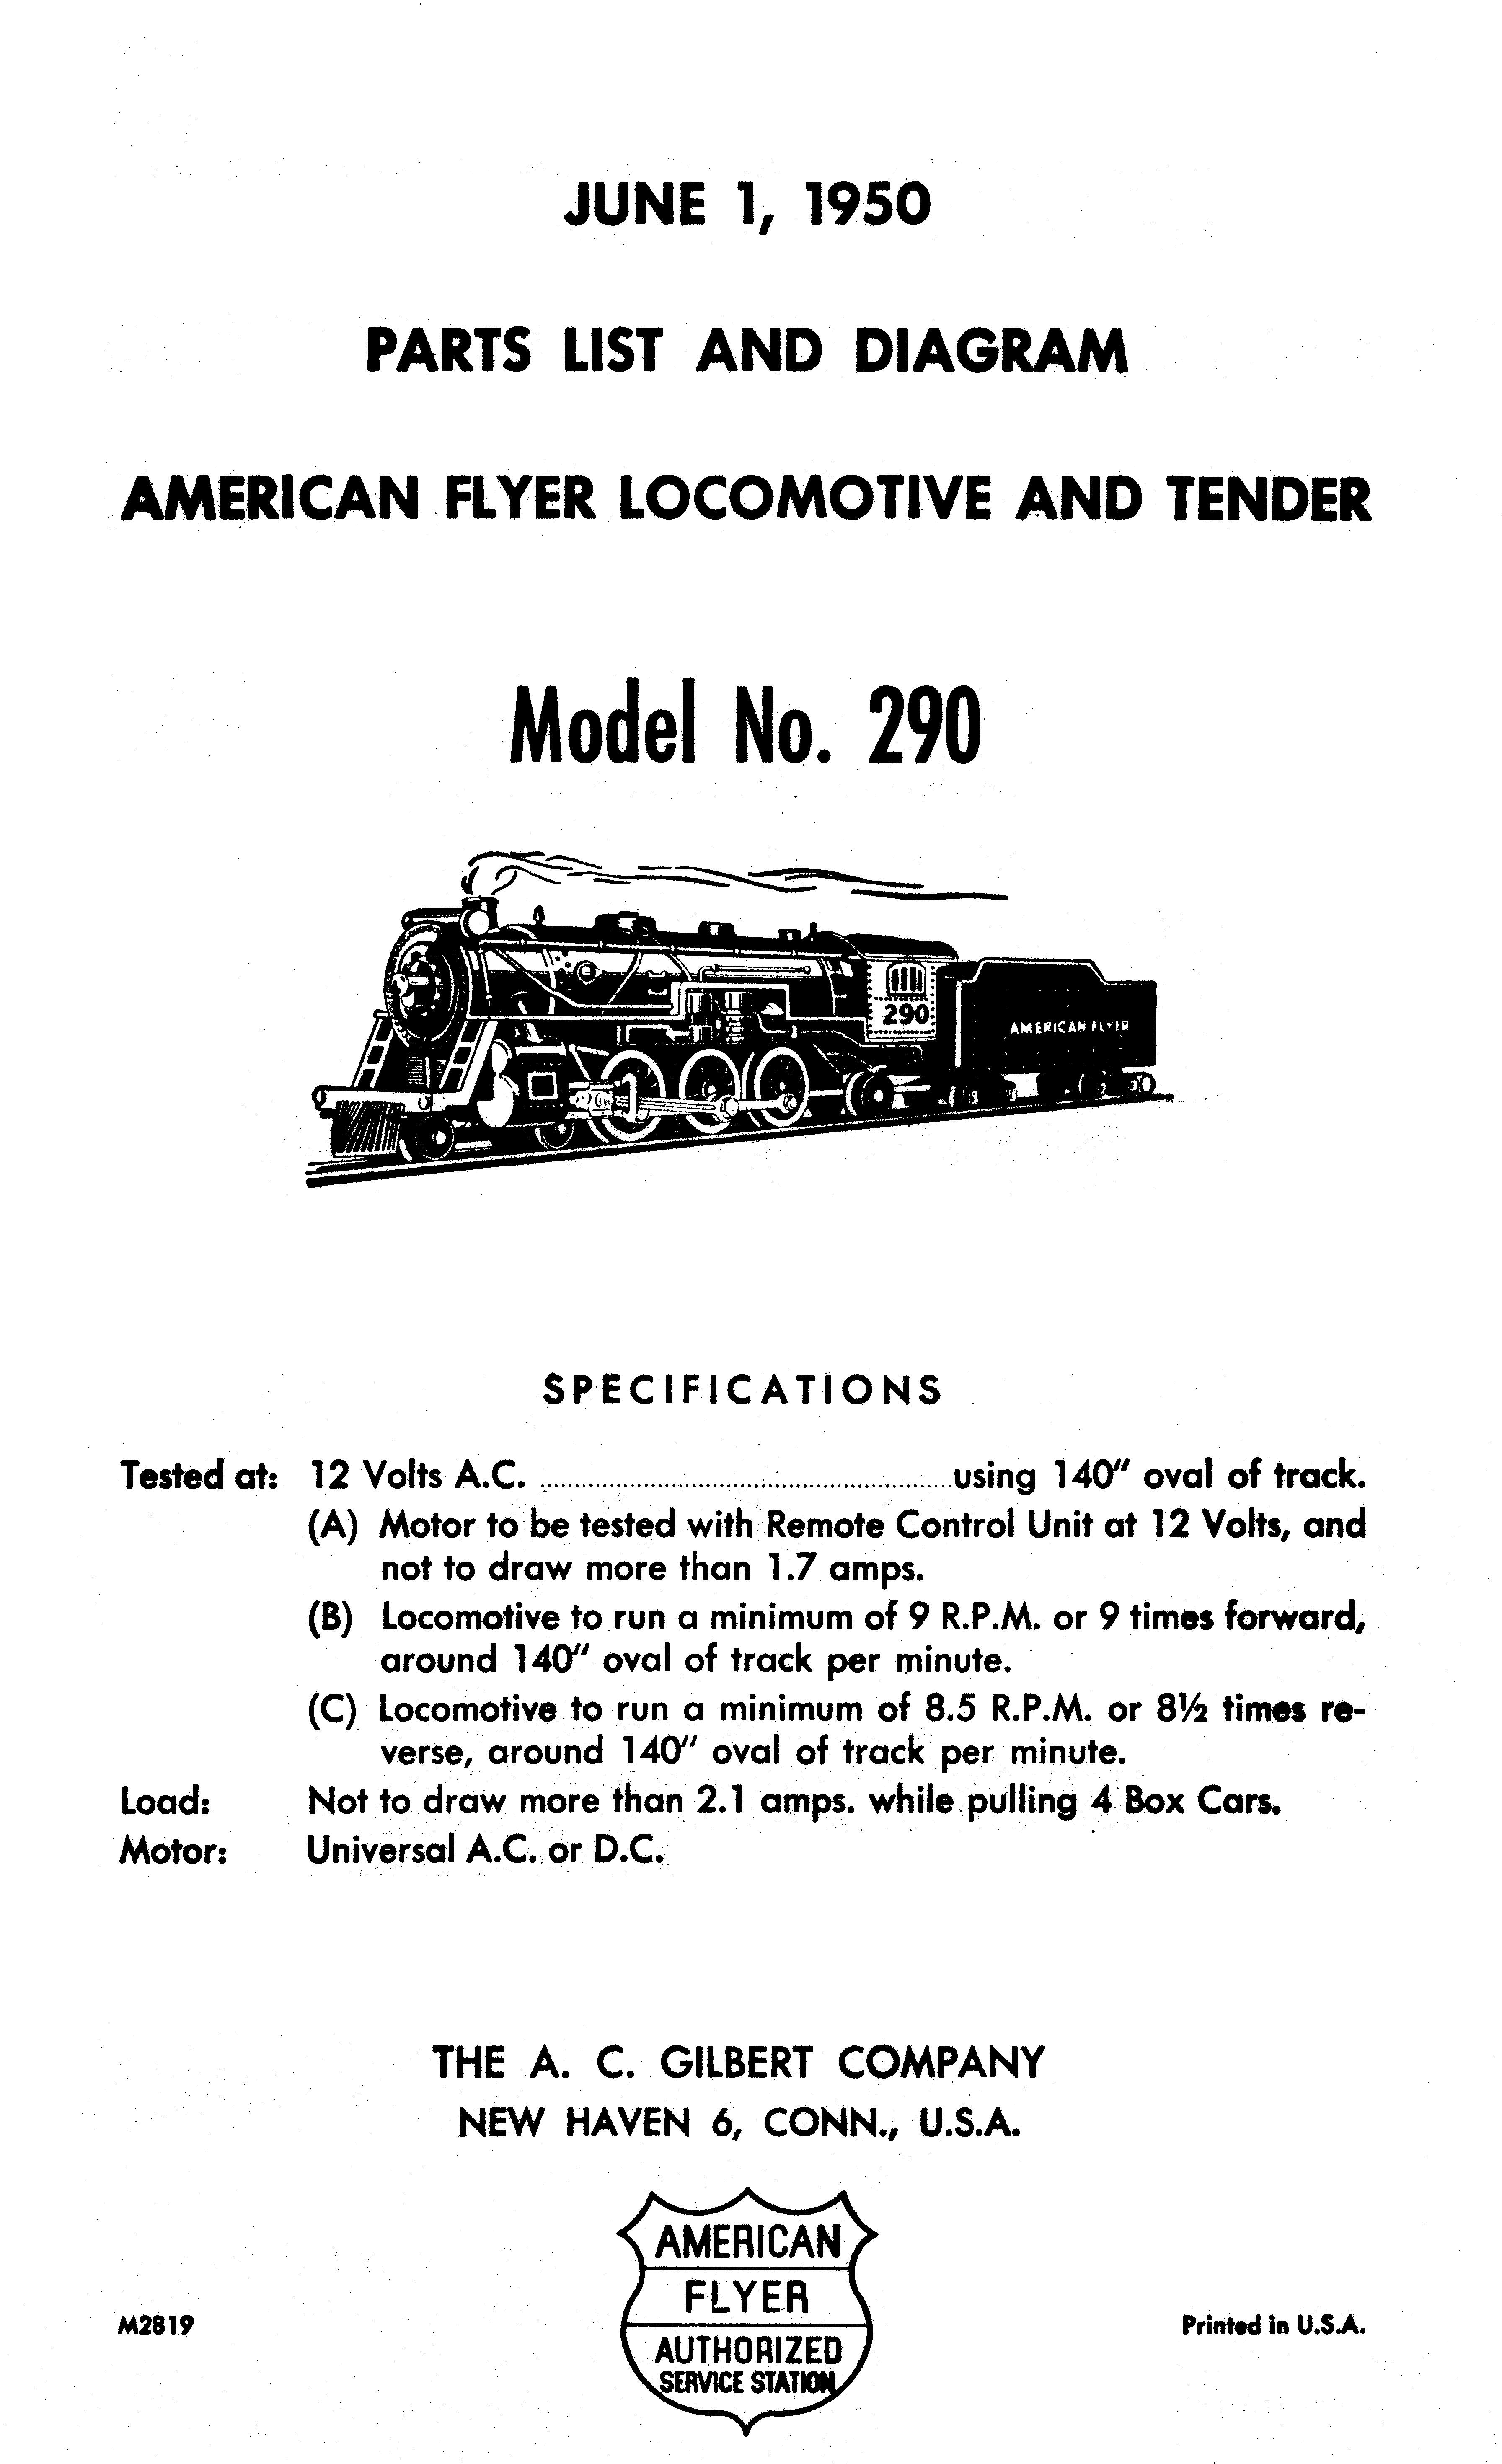 American Flyer Locomotive 290 Parts List and Diagram